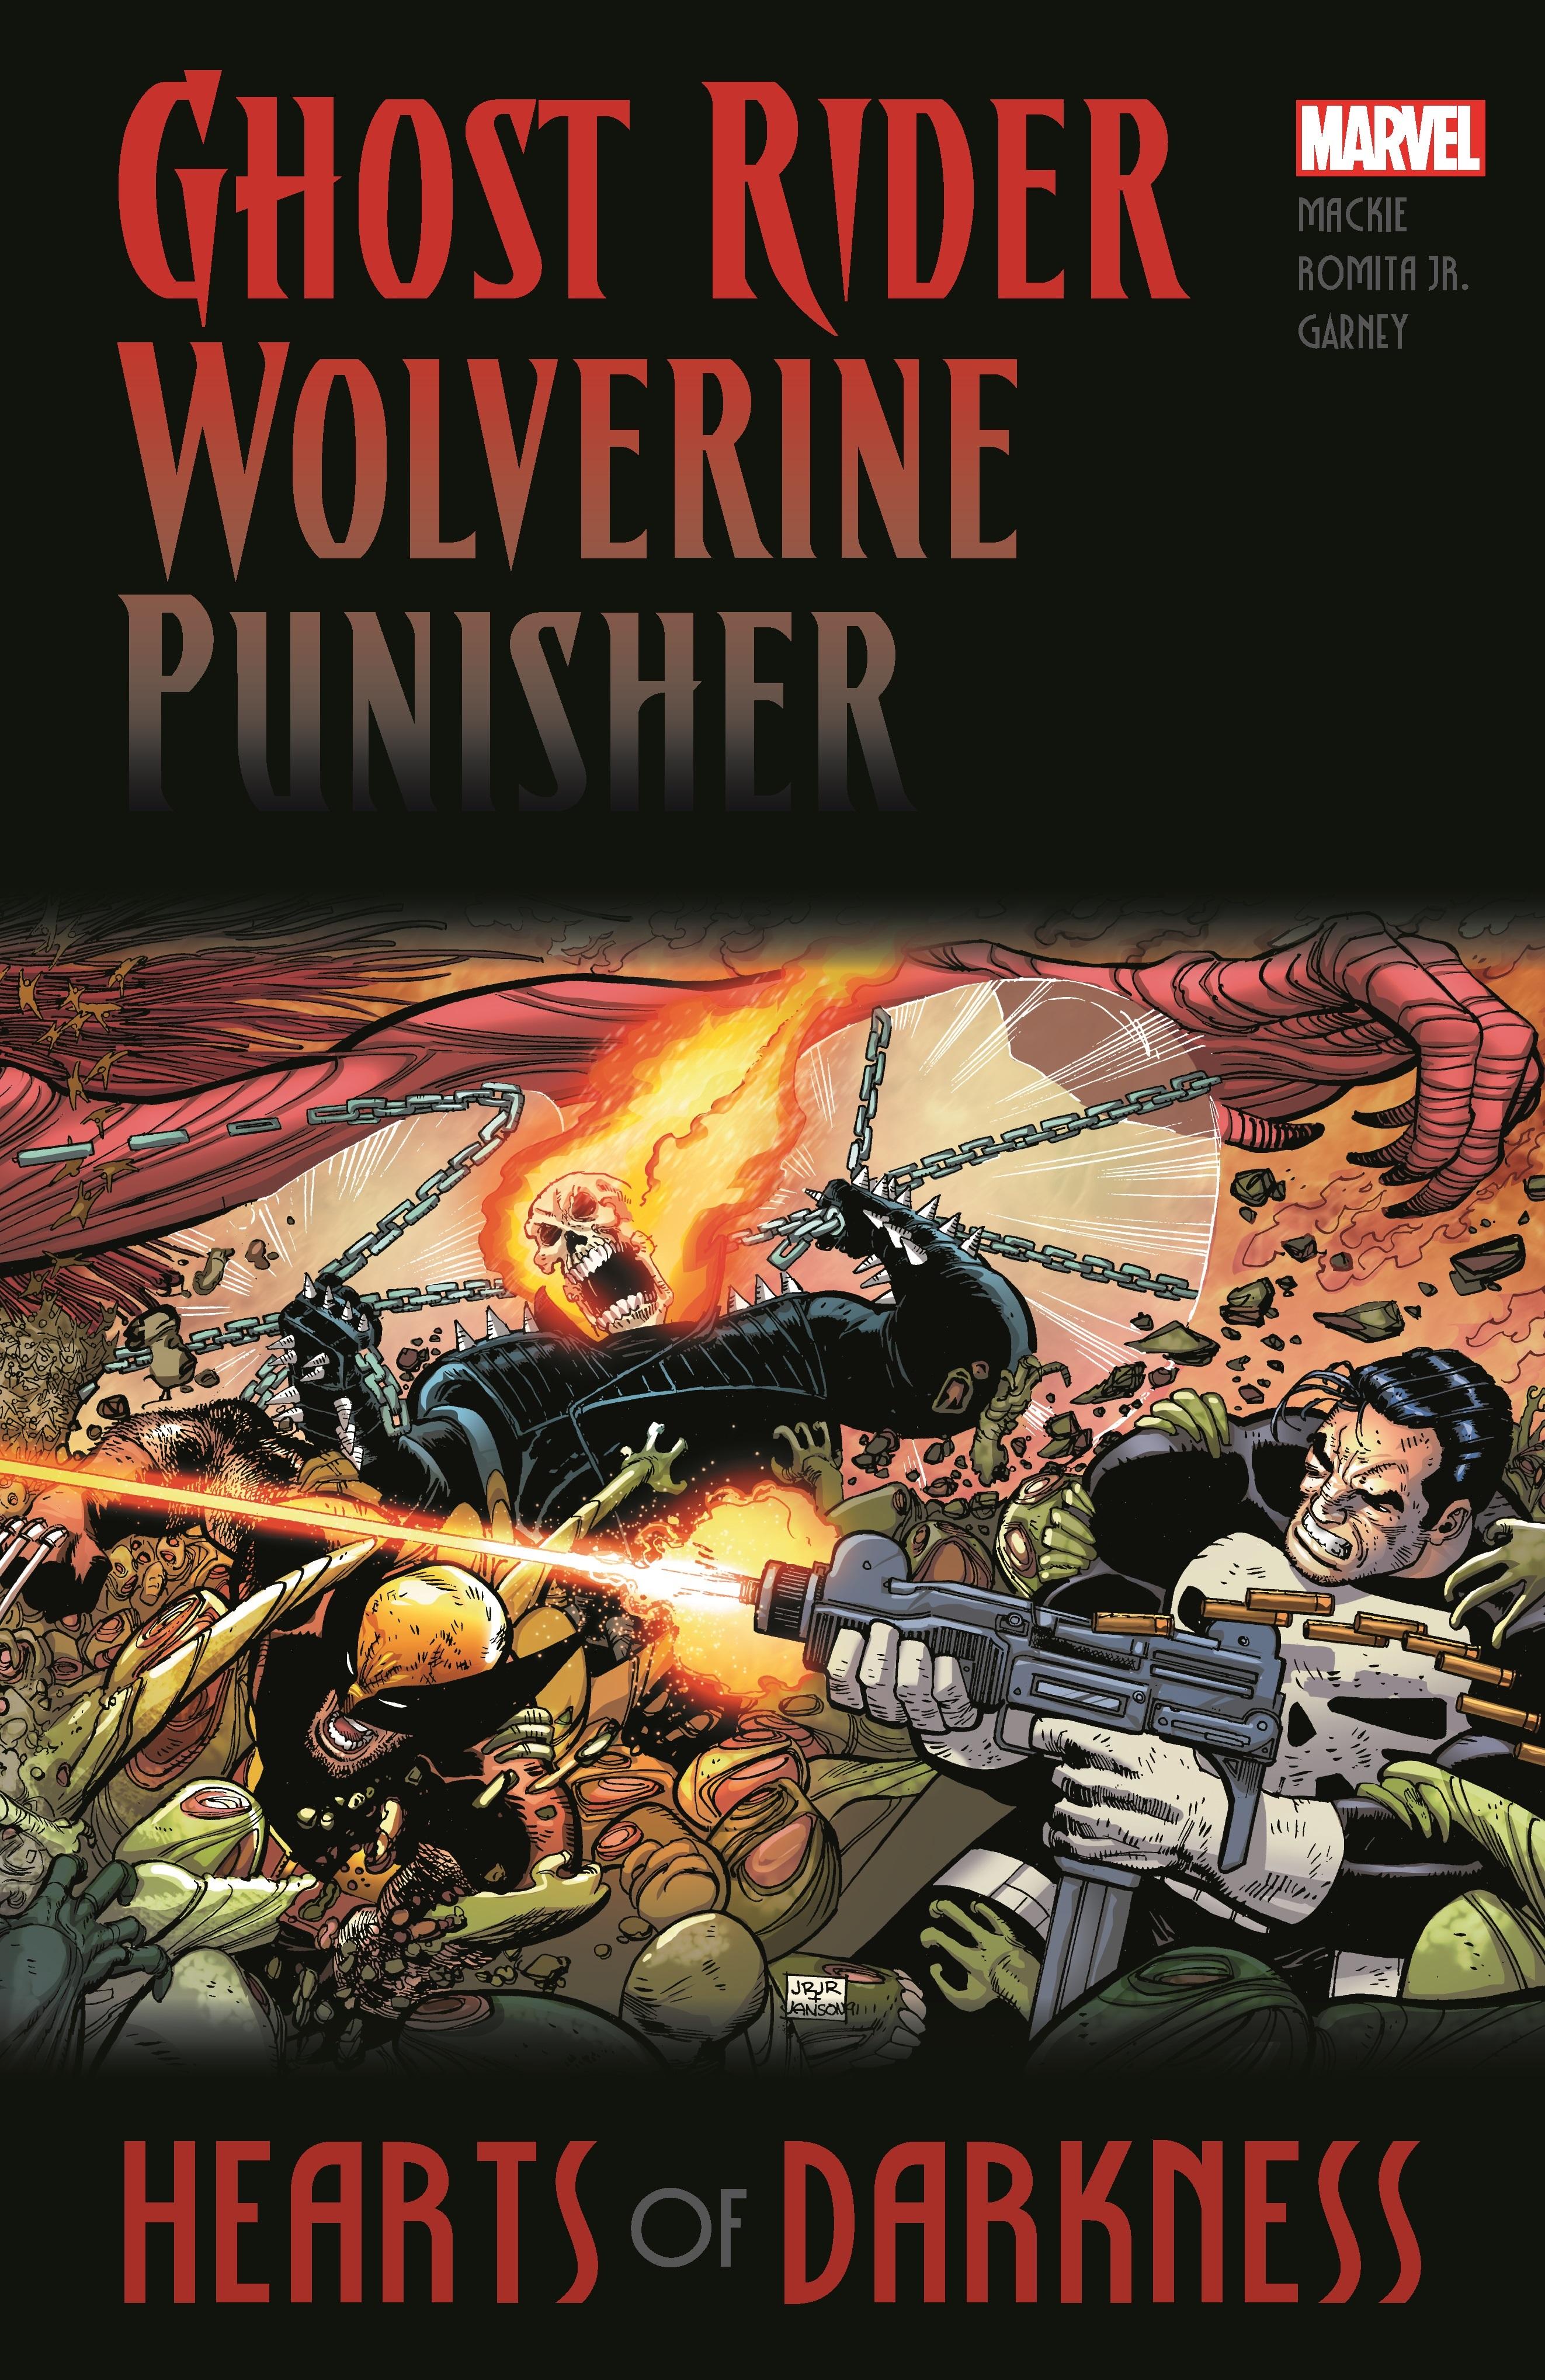 Ghost Rider/Wolverine/Punisher: Hearts of Darkness (Trade Paperback)